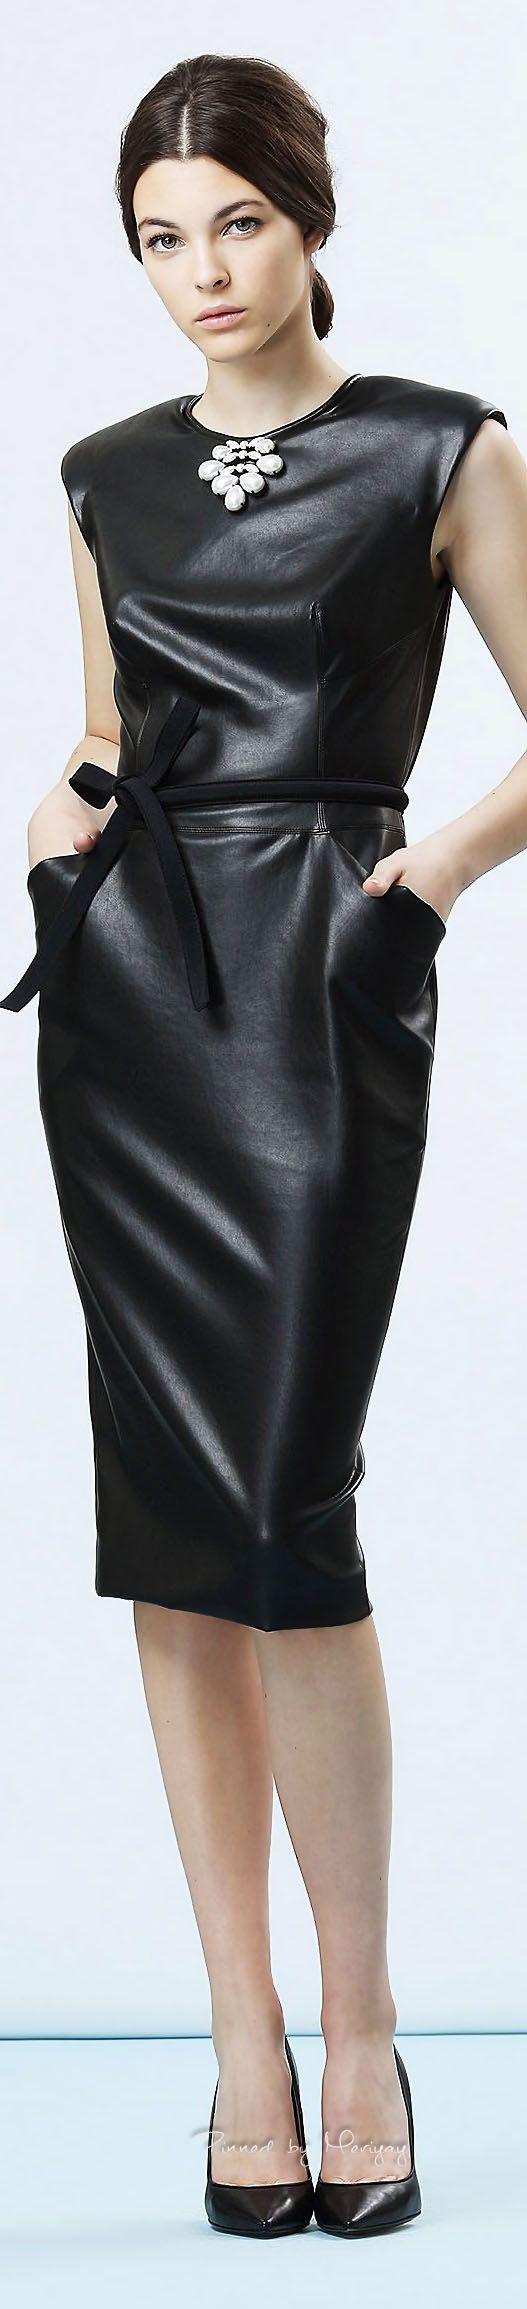 Cocktail dresses / karen cox. Black Leather dress Ermanno Scervino.SS.2015.